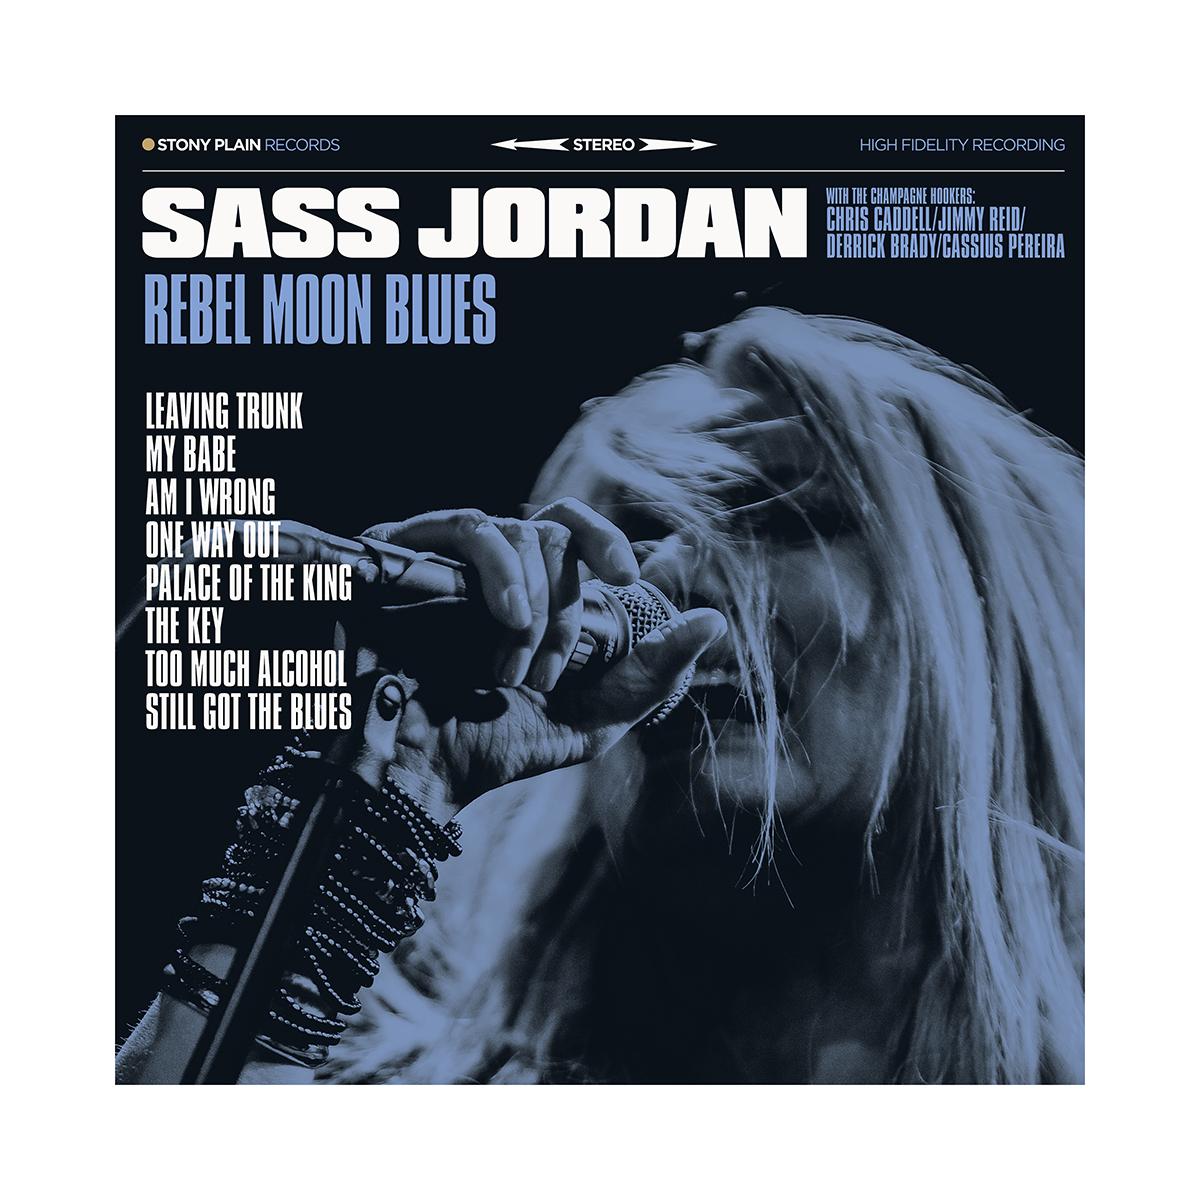 Sass Jordan Rocks The Blues On New Album Rebel Moon Blues